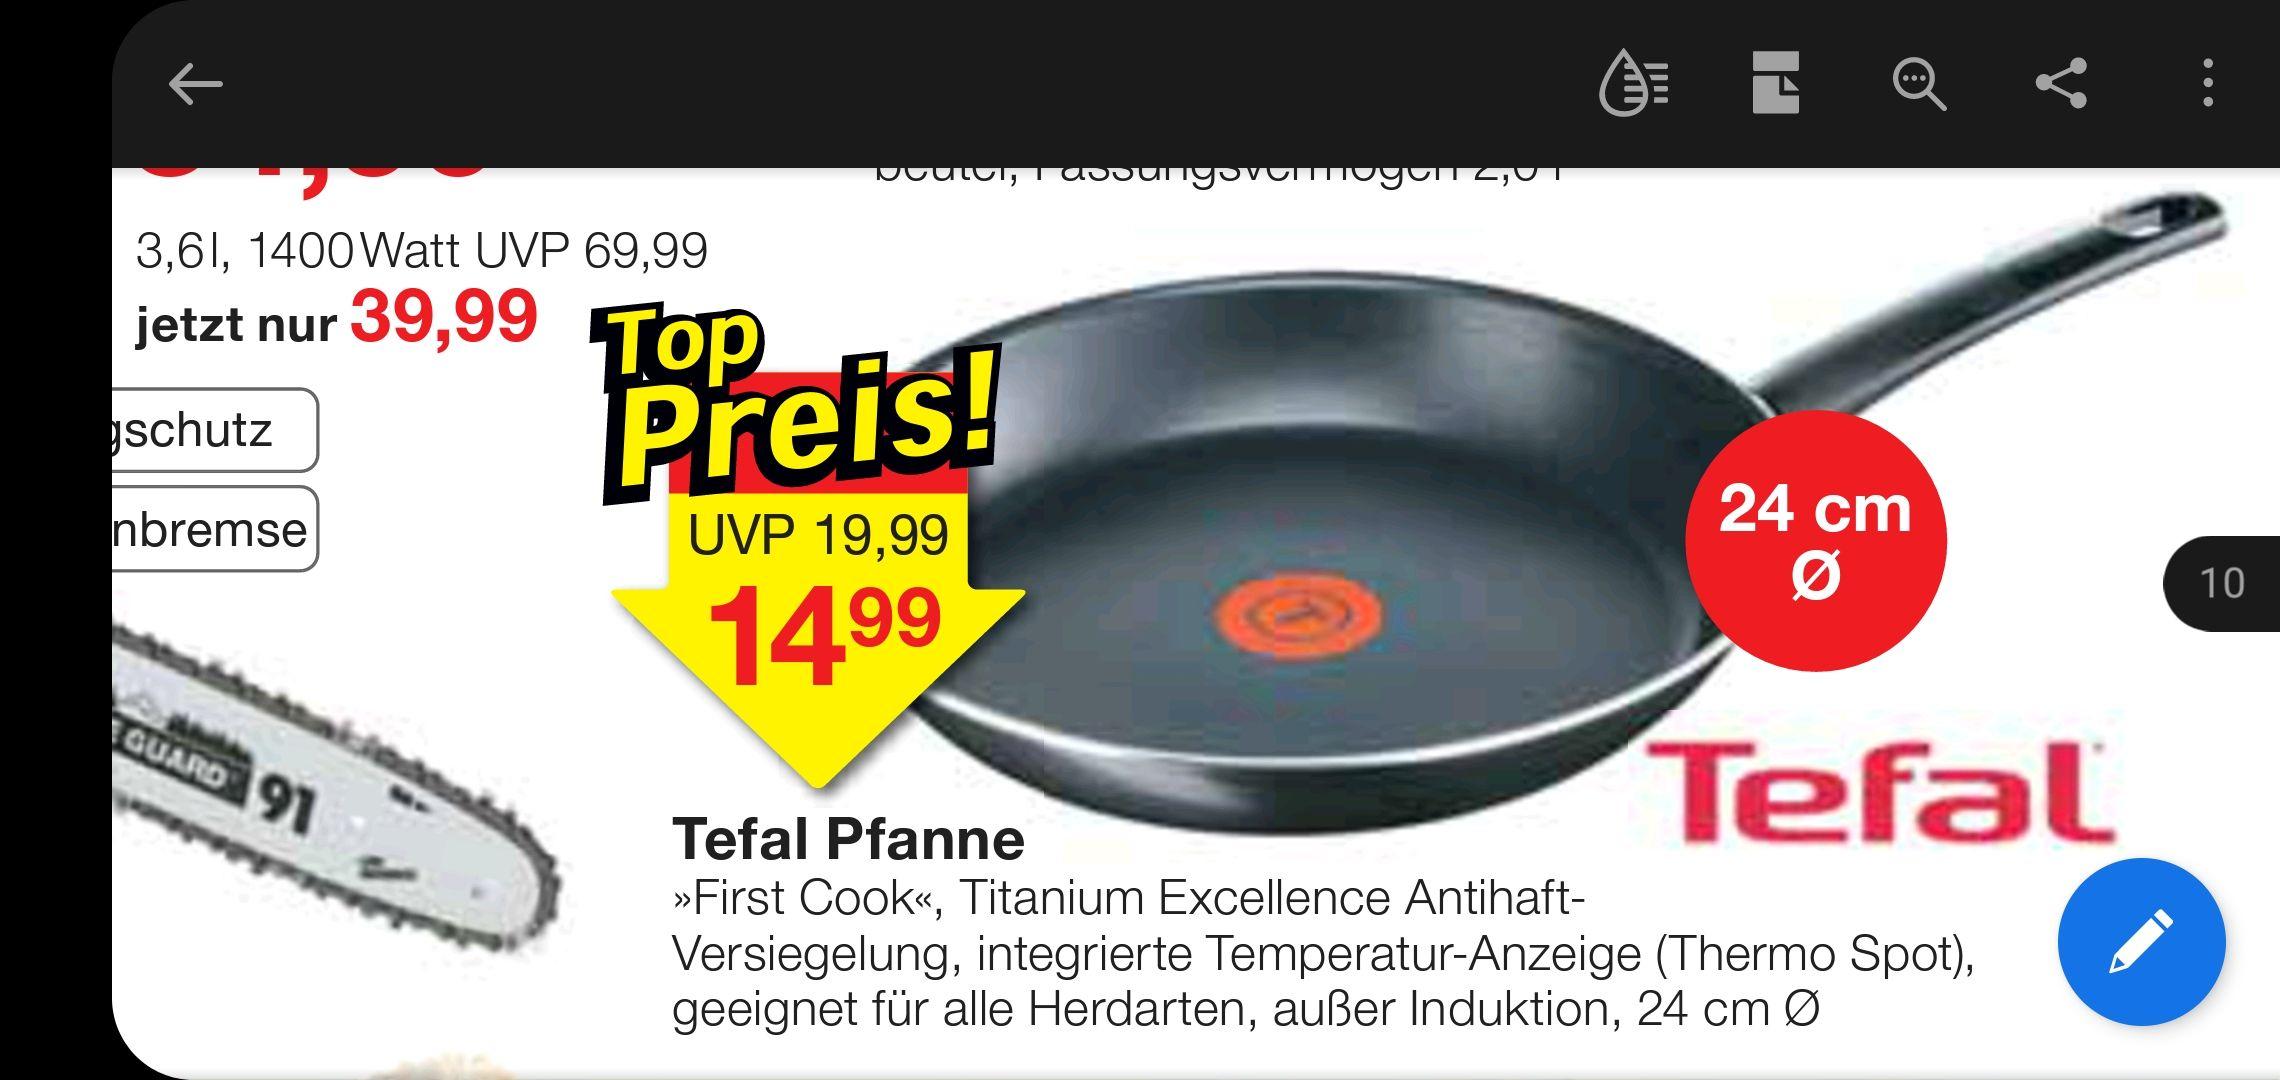 Tefal Pfanne 24 cm